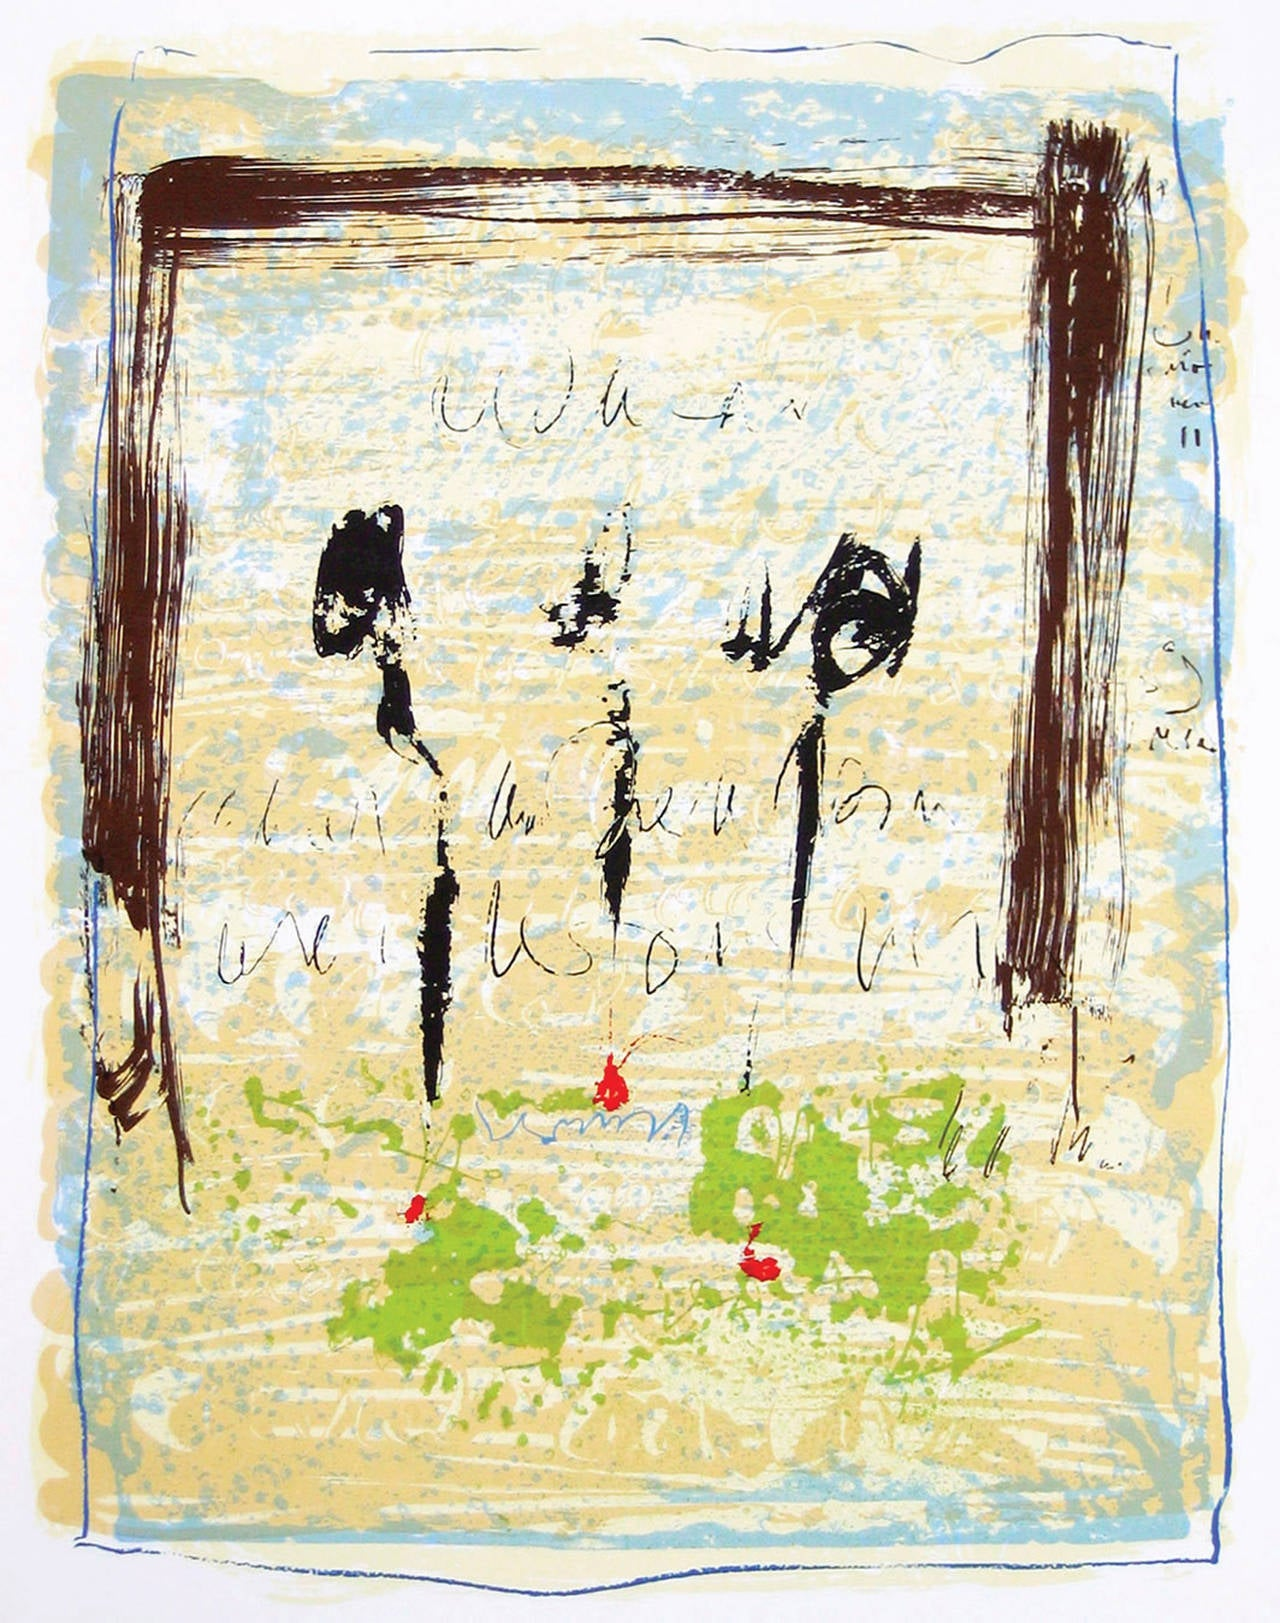 Alice Teichert Abstract Drawing - The Text Is Still Unwritten - Tango